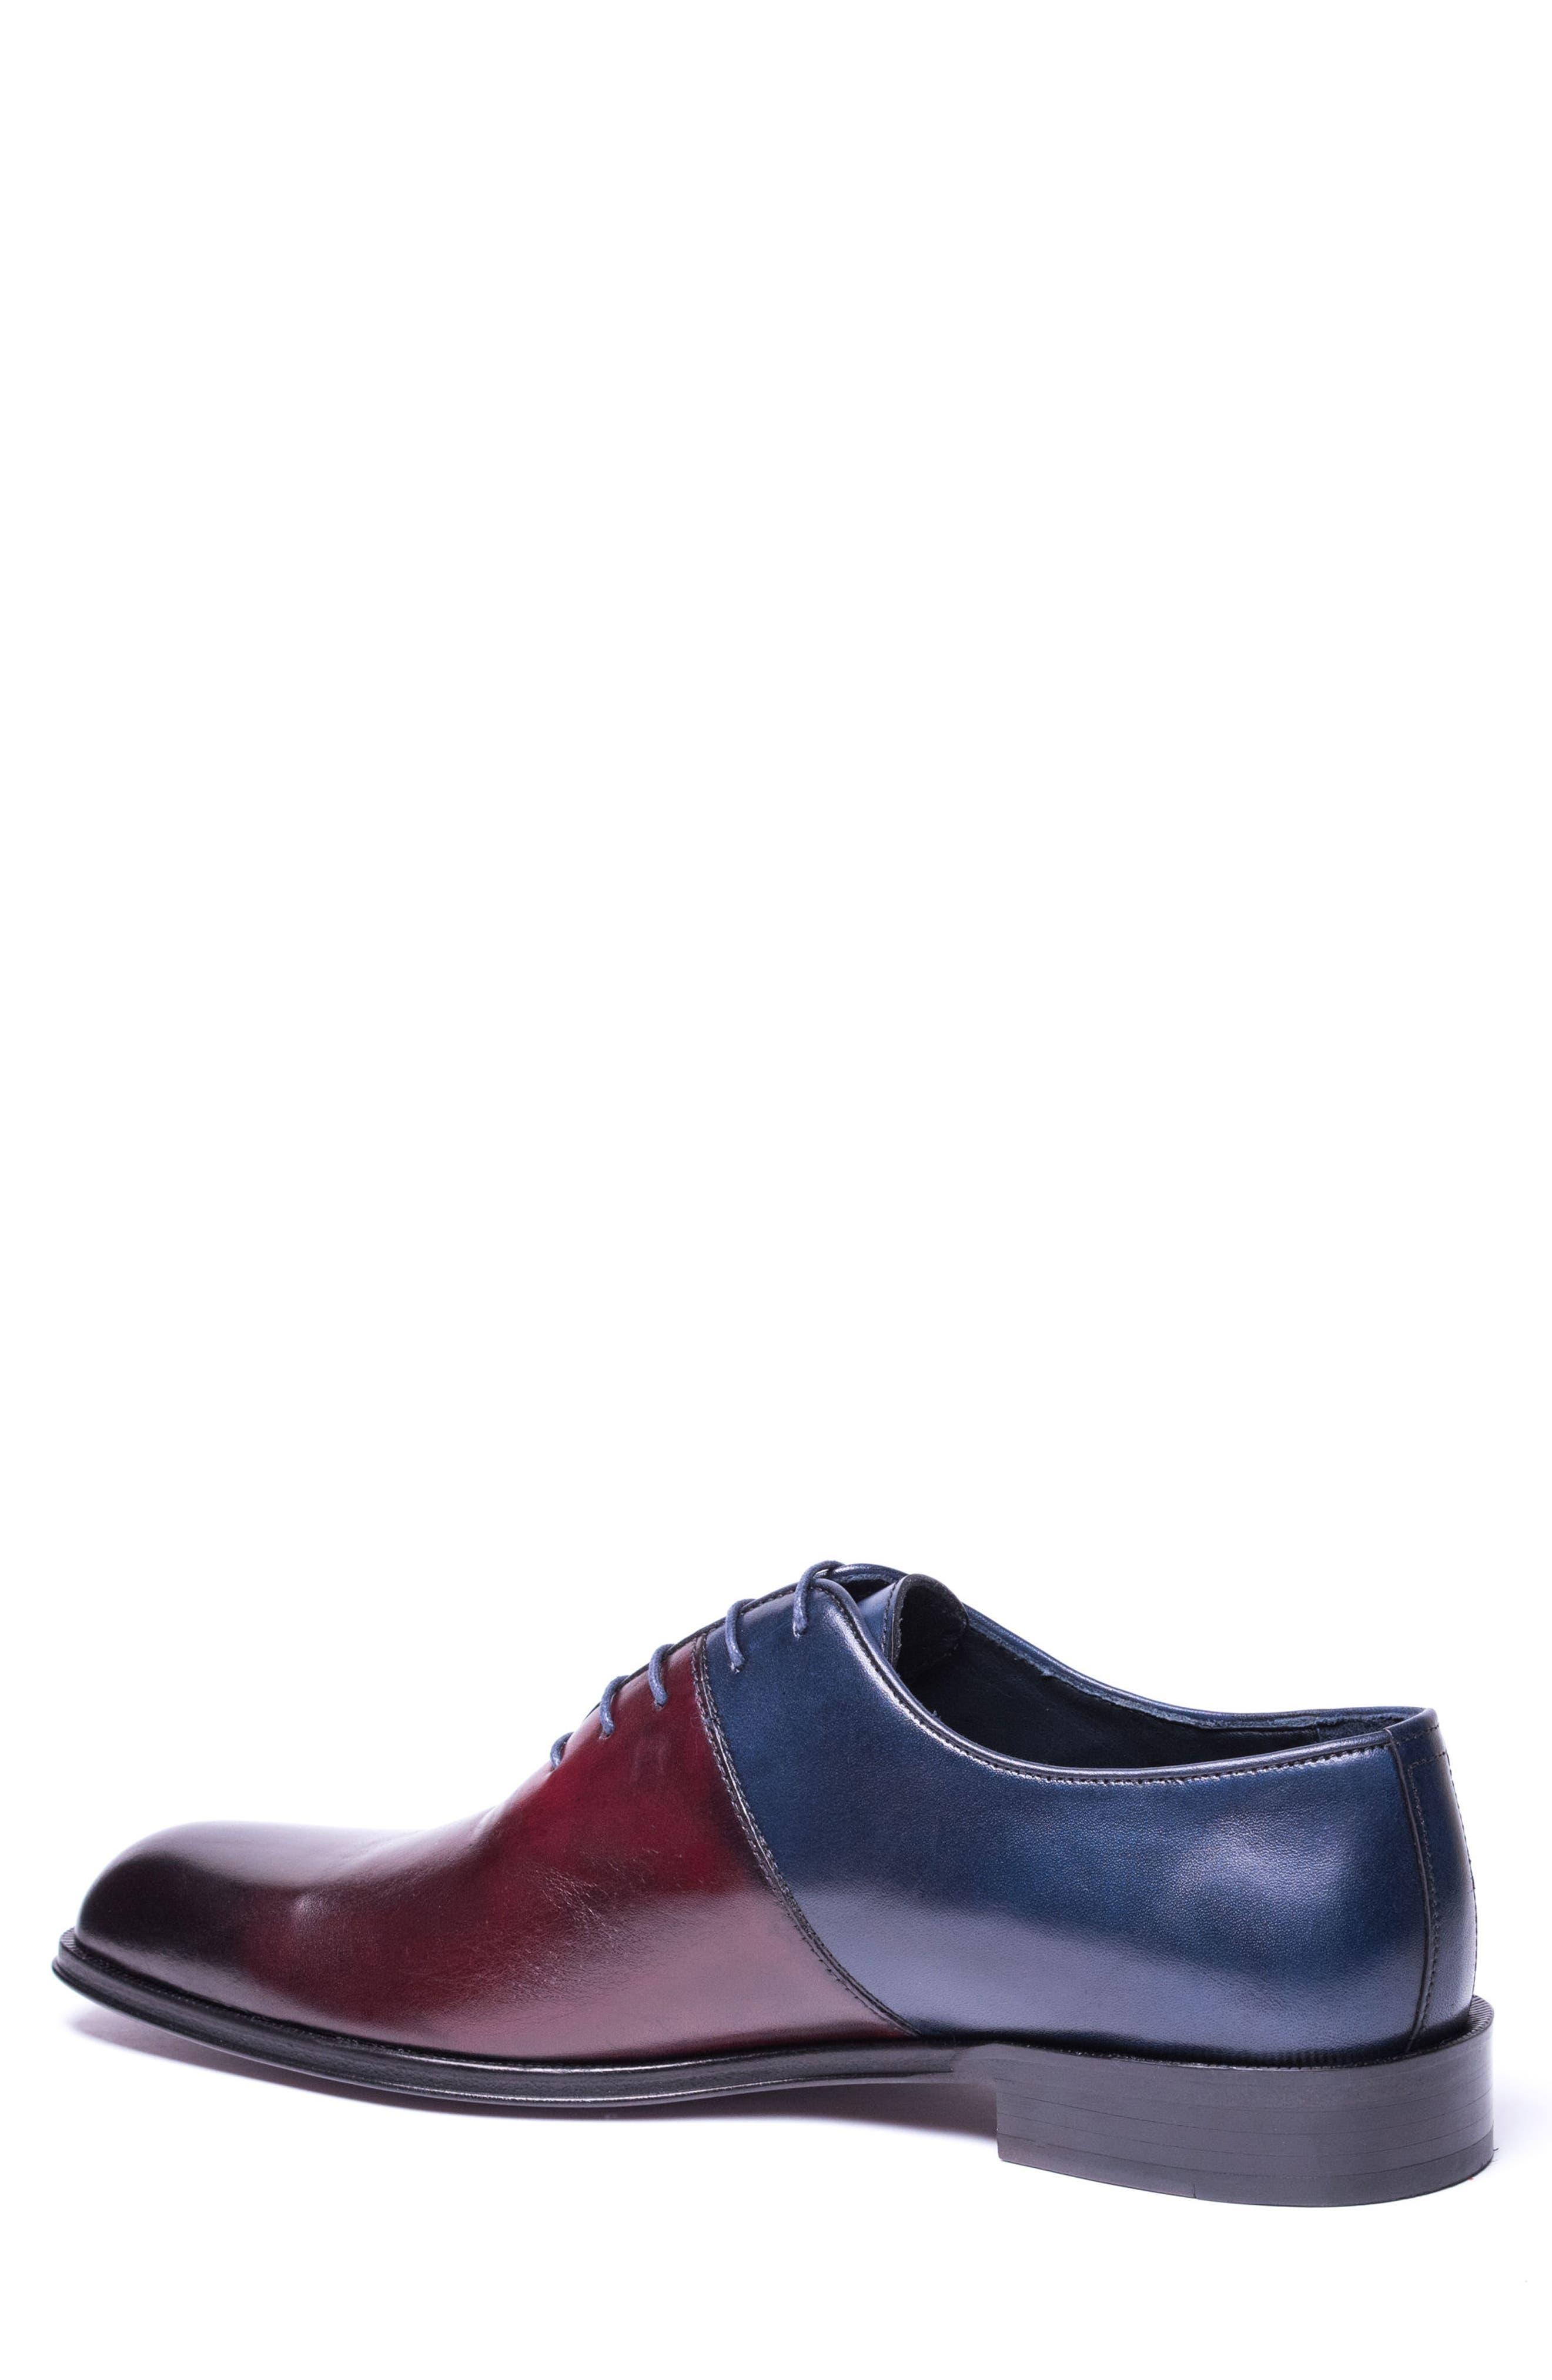 Wyatt Colorblocked Whole Cut Shoe,                             Alternate thumbnail 2, color,                             Burgundy Leather